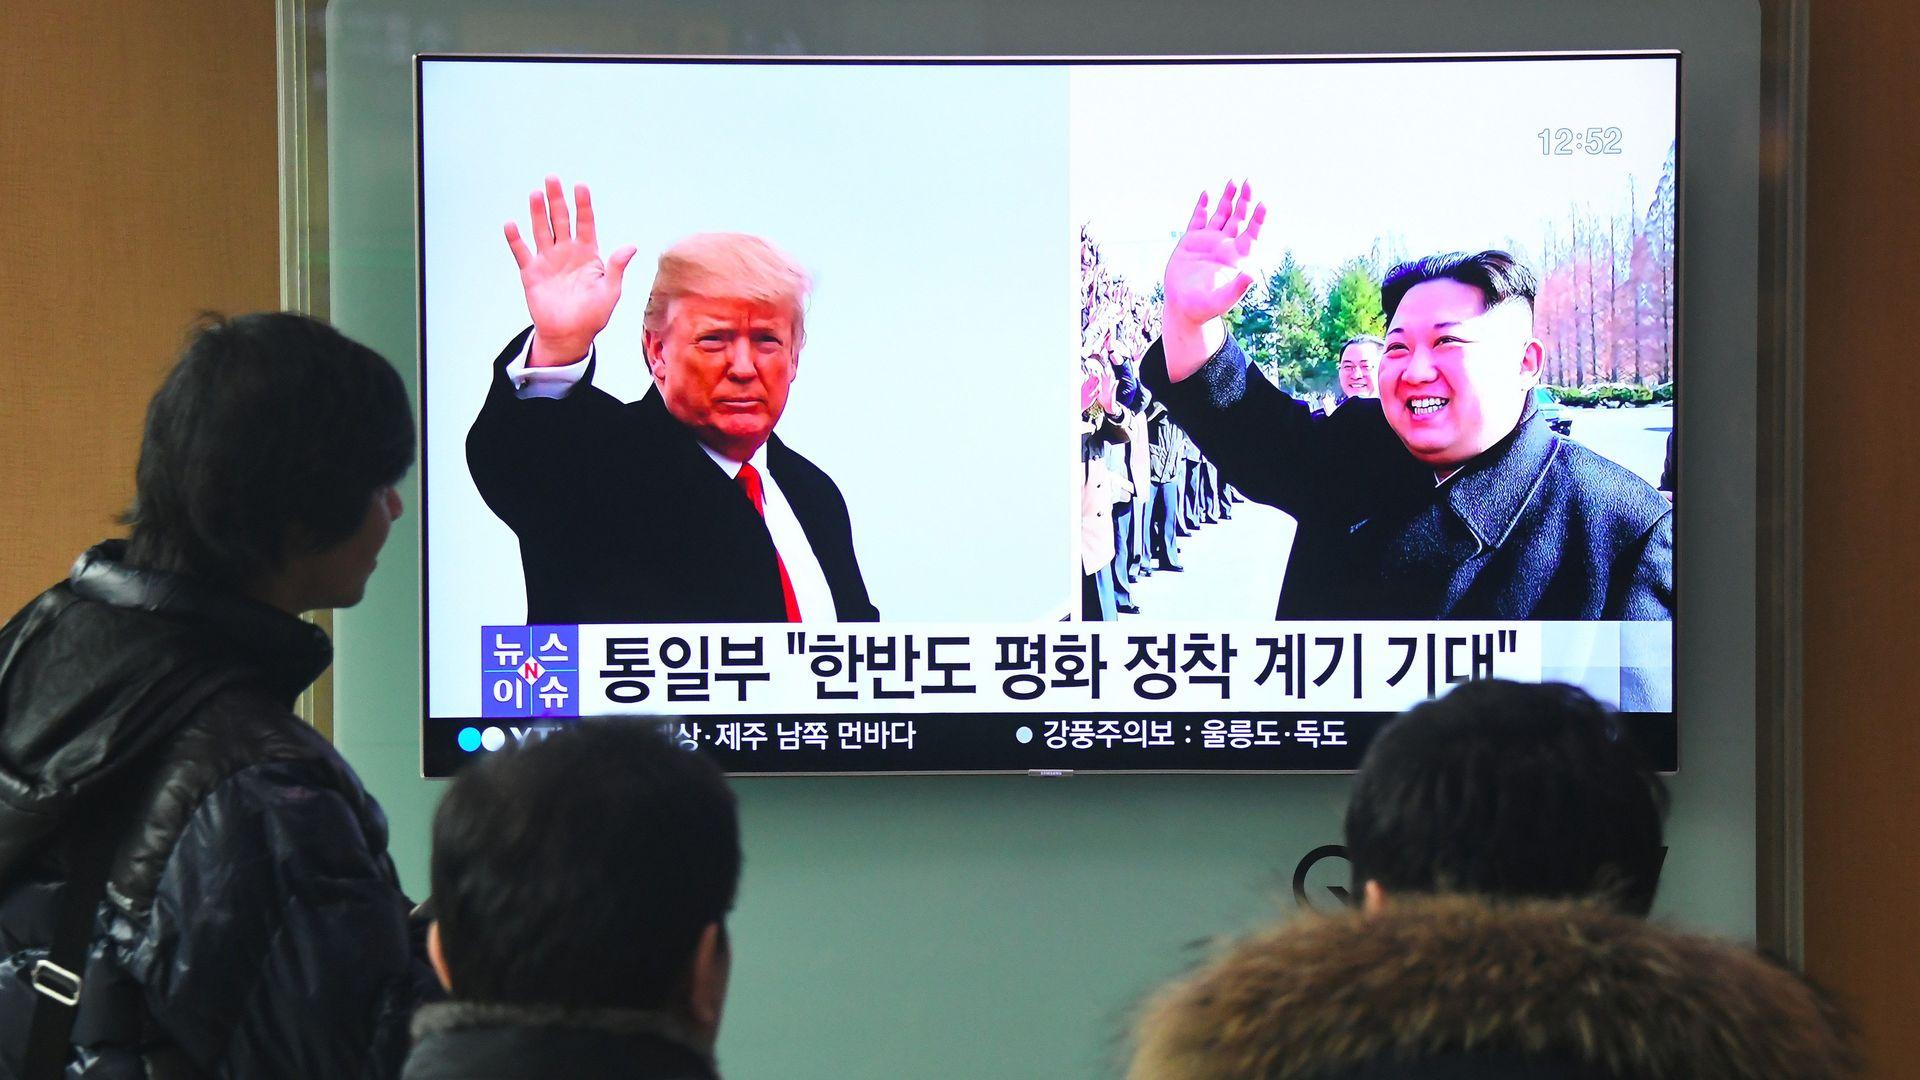 TV screen showing Donald Trump and King Jong-un